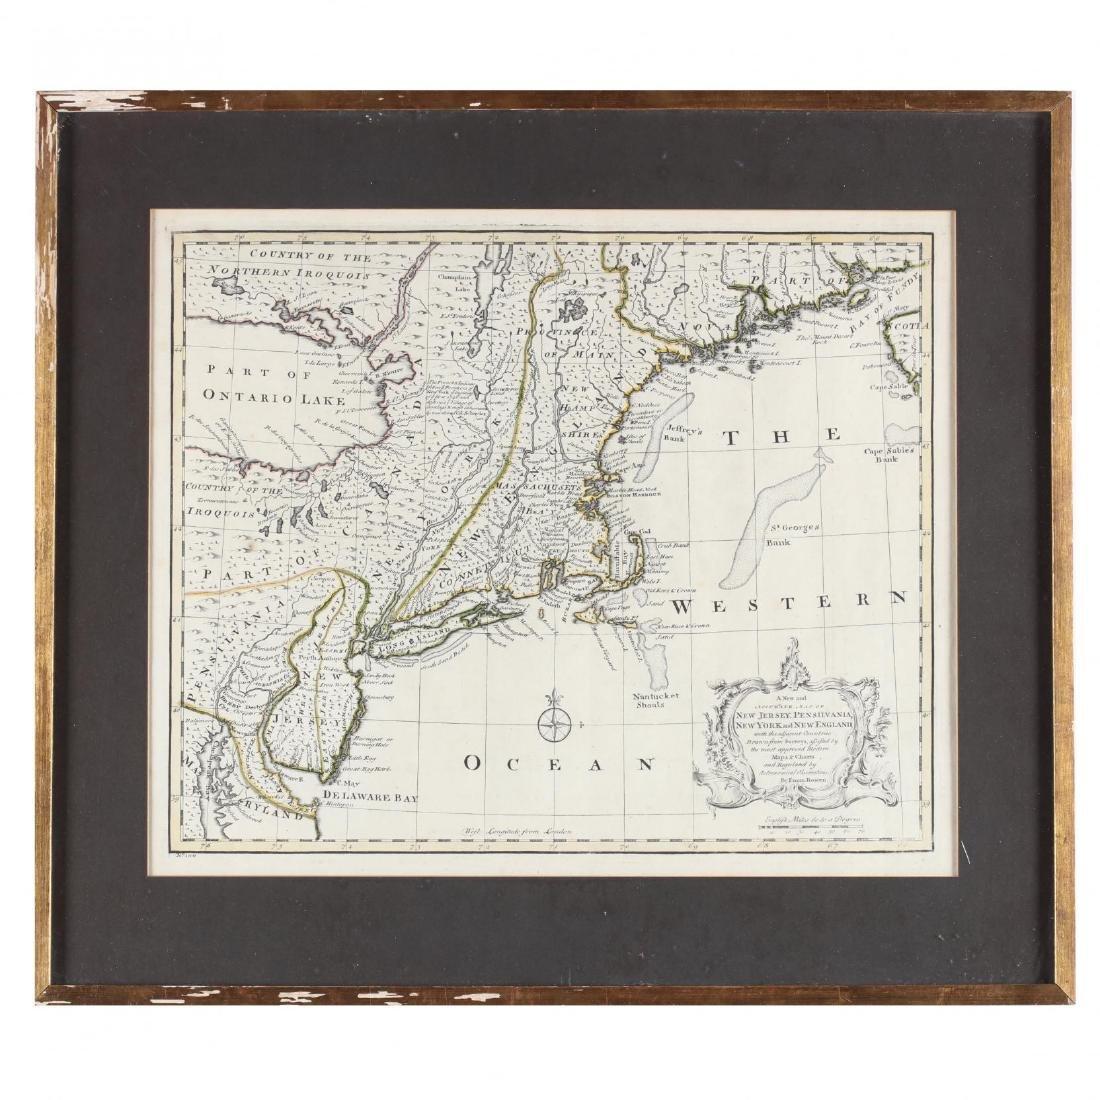 Two Emanuel Bowen Maps Showing the East Coast - 2